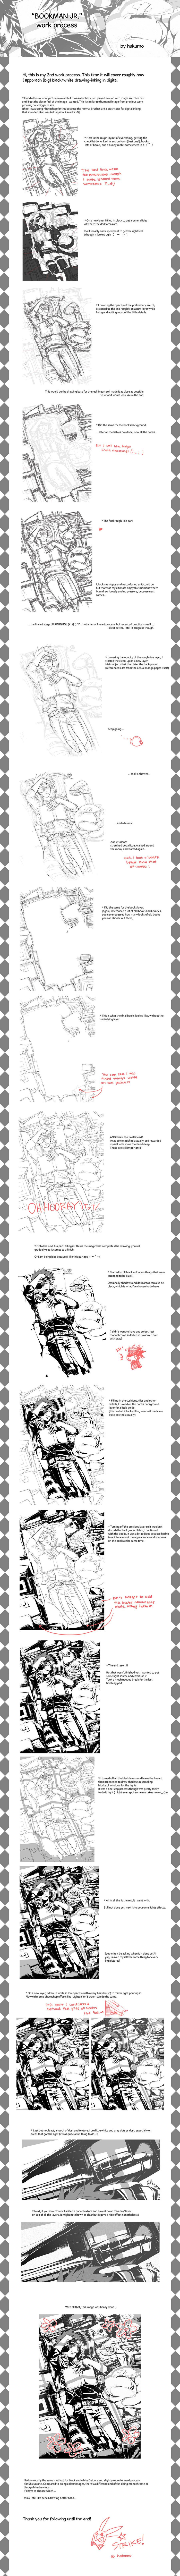 'Bookman Jr.' Work process by hakumo